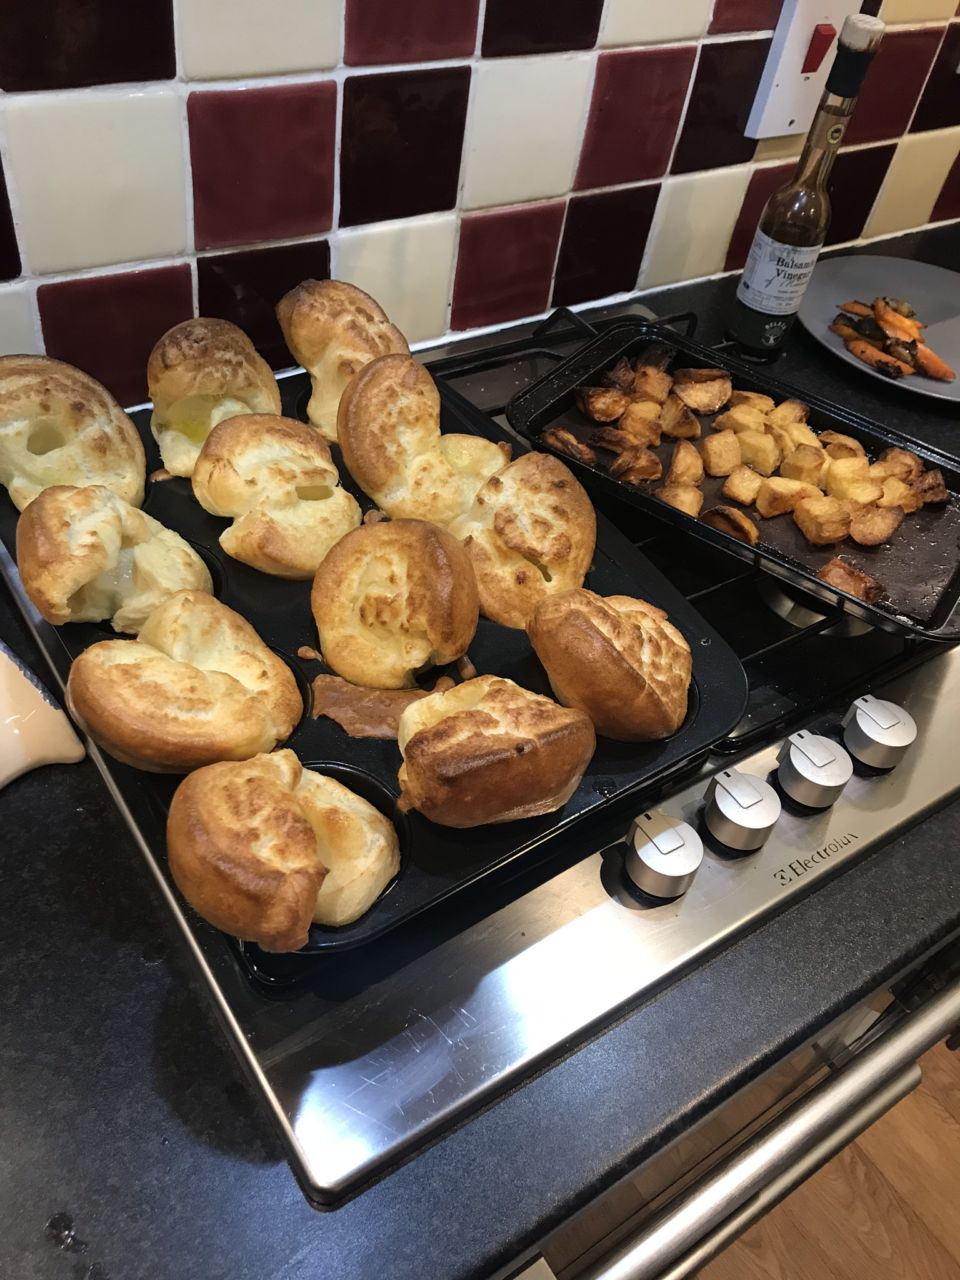 Yorkshire puddings and roast potatoes - Roast Dinner